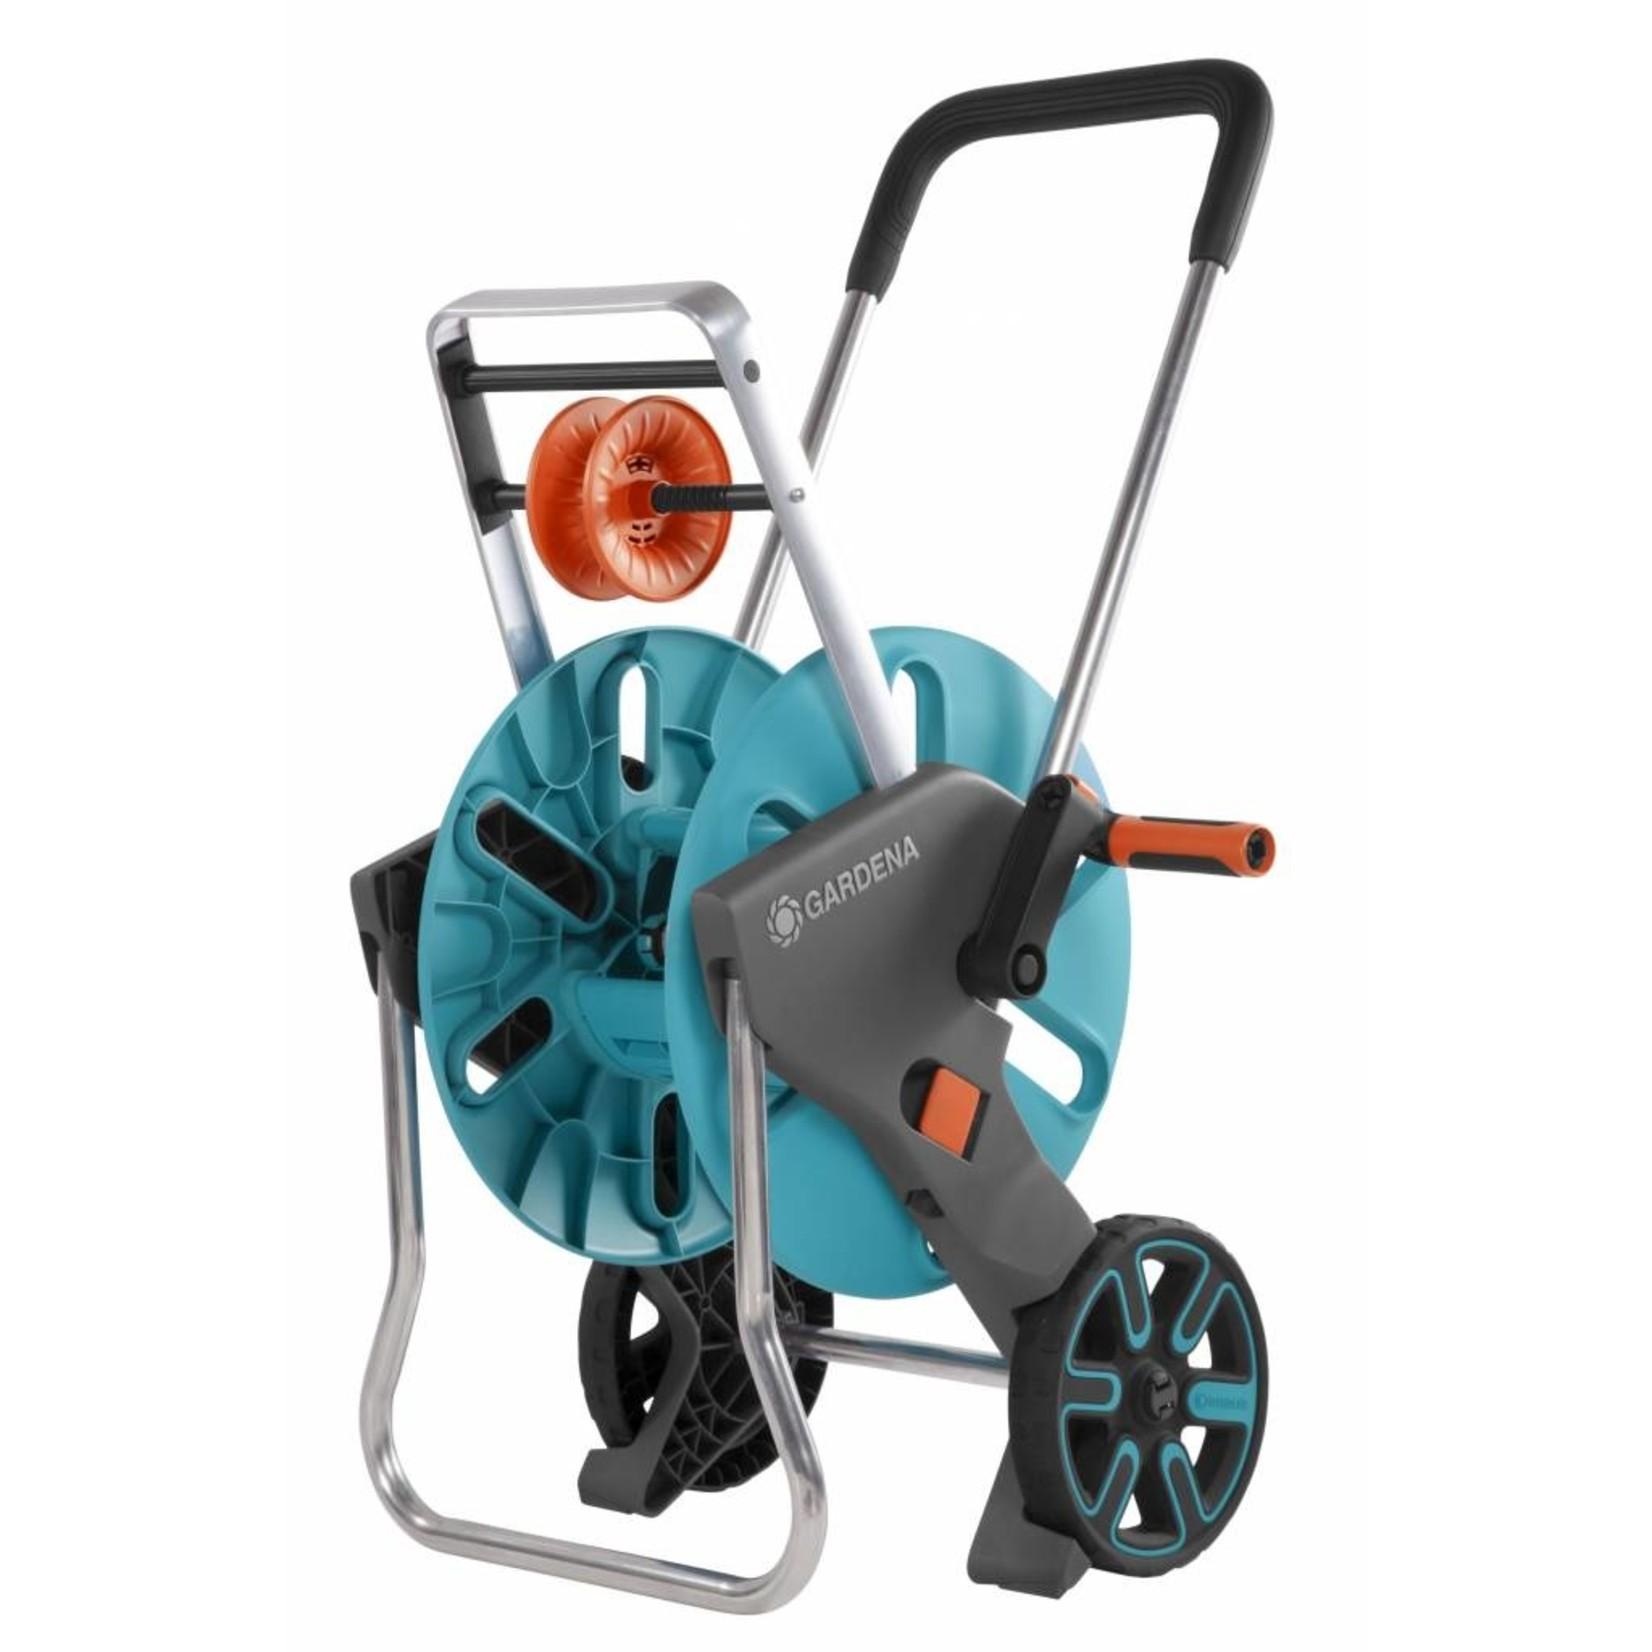 Gardena Slangenwagen AquaRoll M Easy